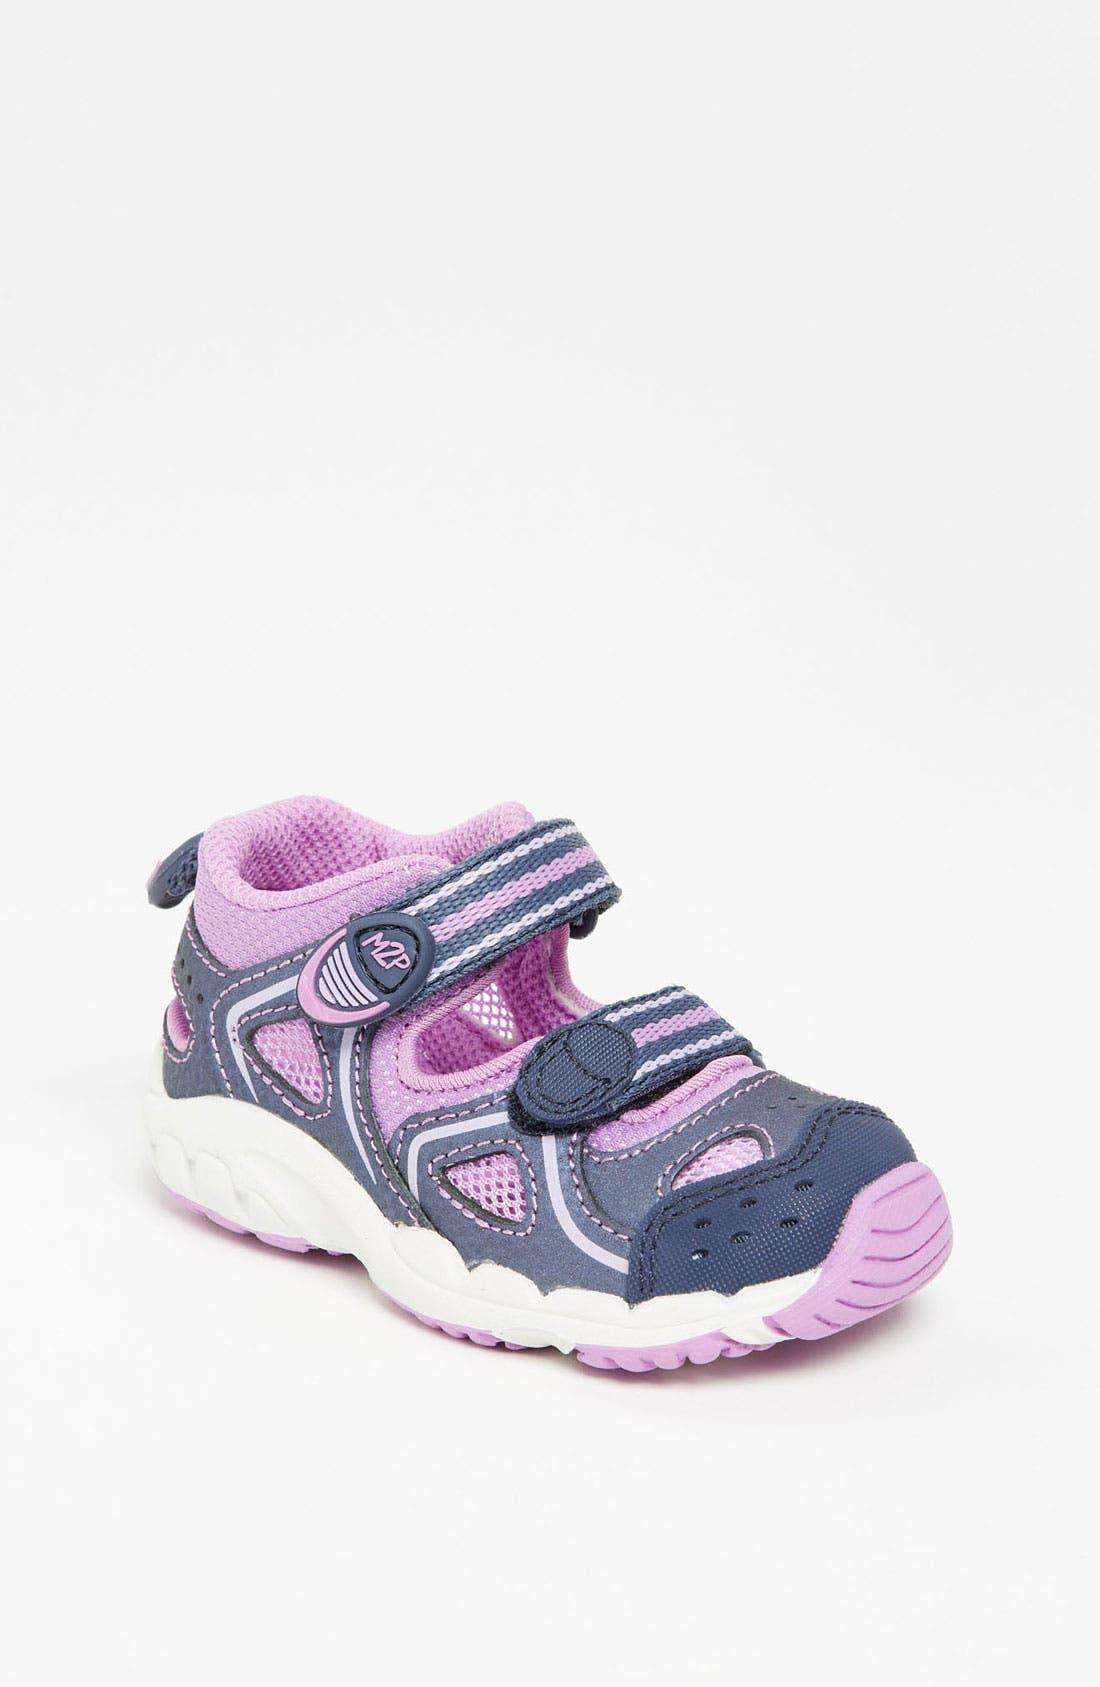 Alternate Image 1 Selected - Stride Rite 'Baby Liddie' Sandal (Baby, Walker & Toddler)